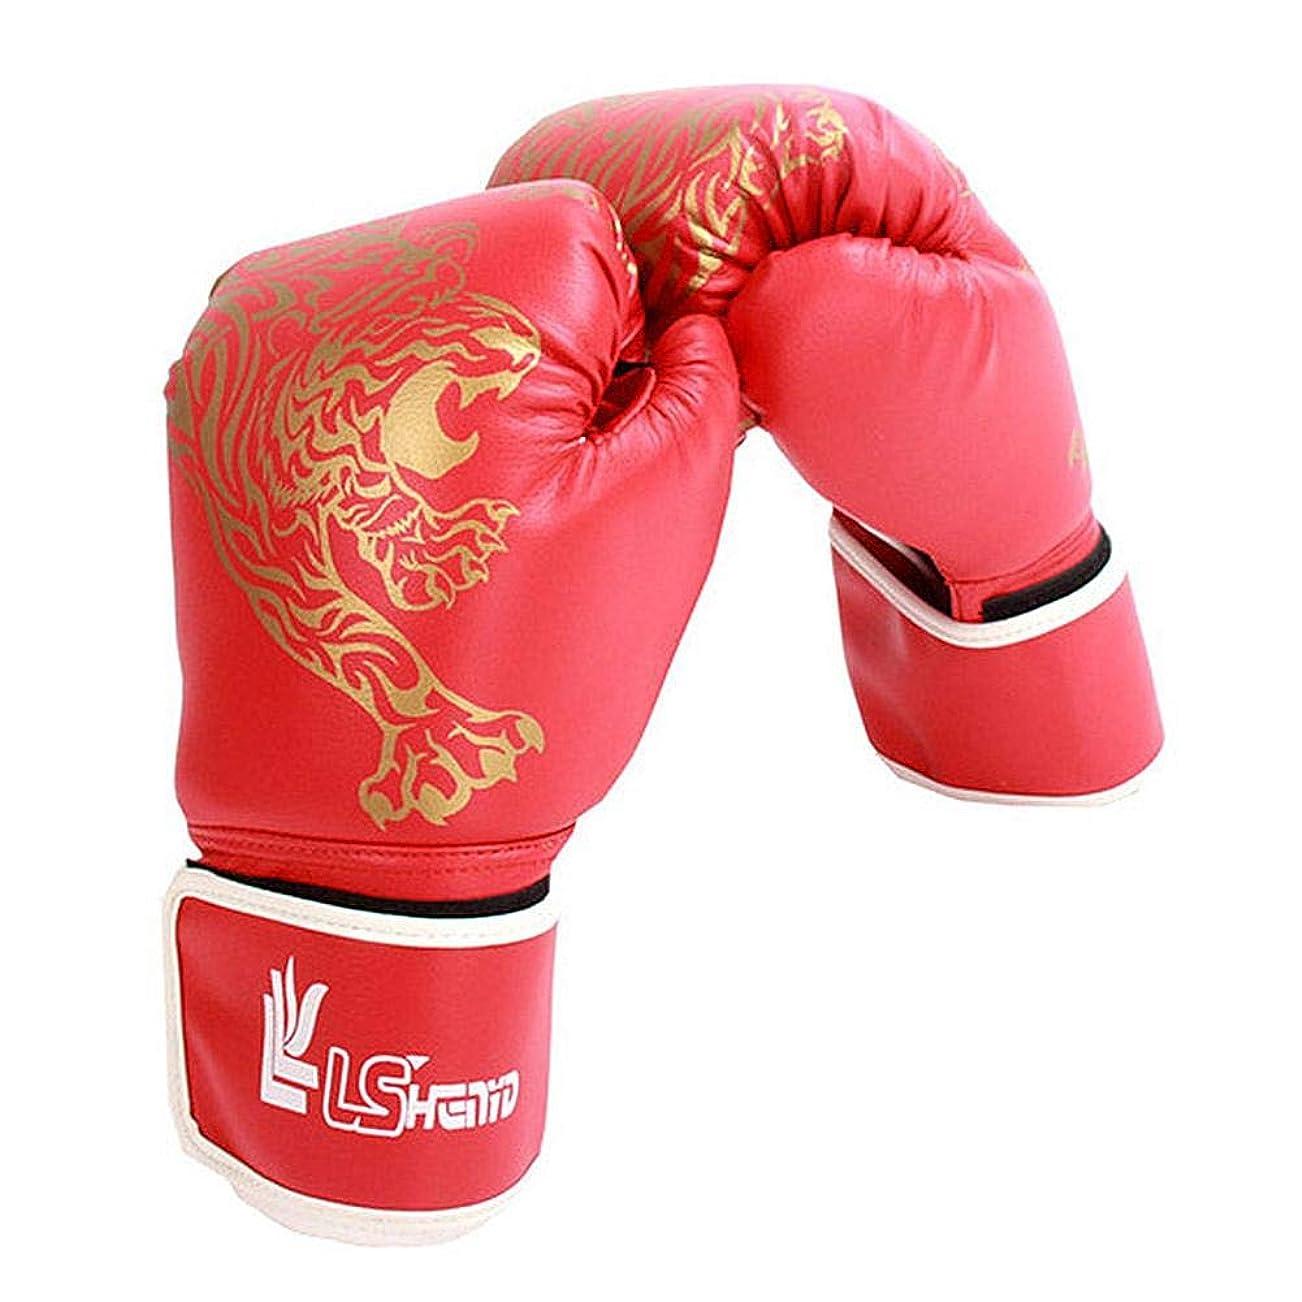 Viugreum ボクシンググローブ グローブ パンチンググローブ キックボクシング 肉厚クッション ザートレーニング手袋 格闘技 空手 ミット